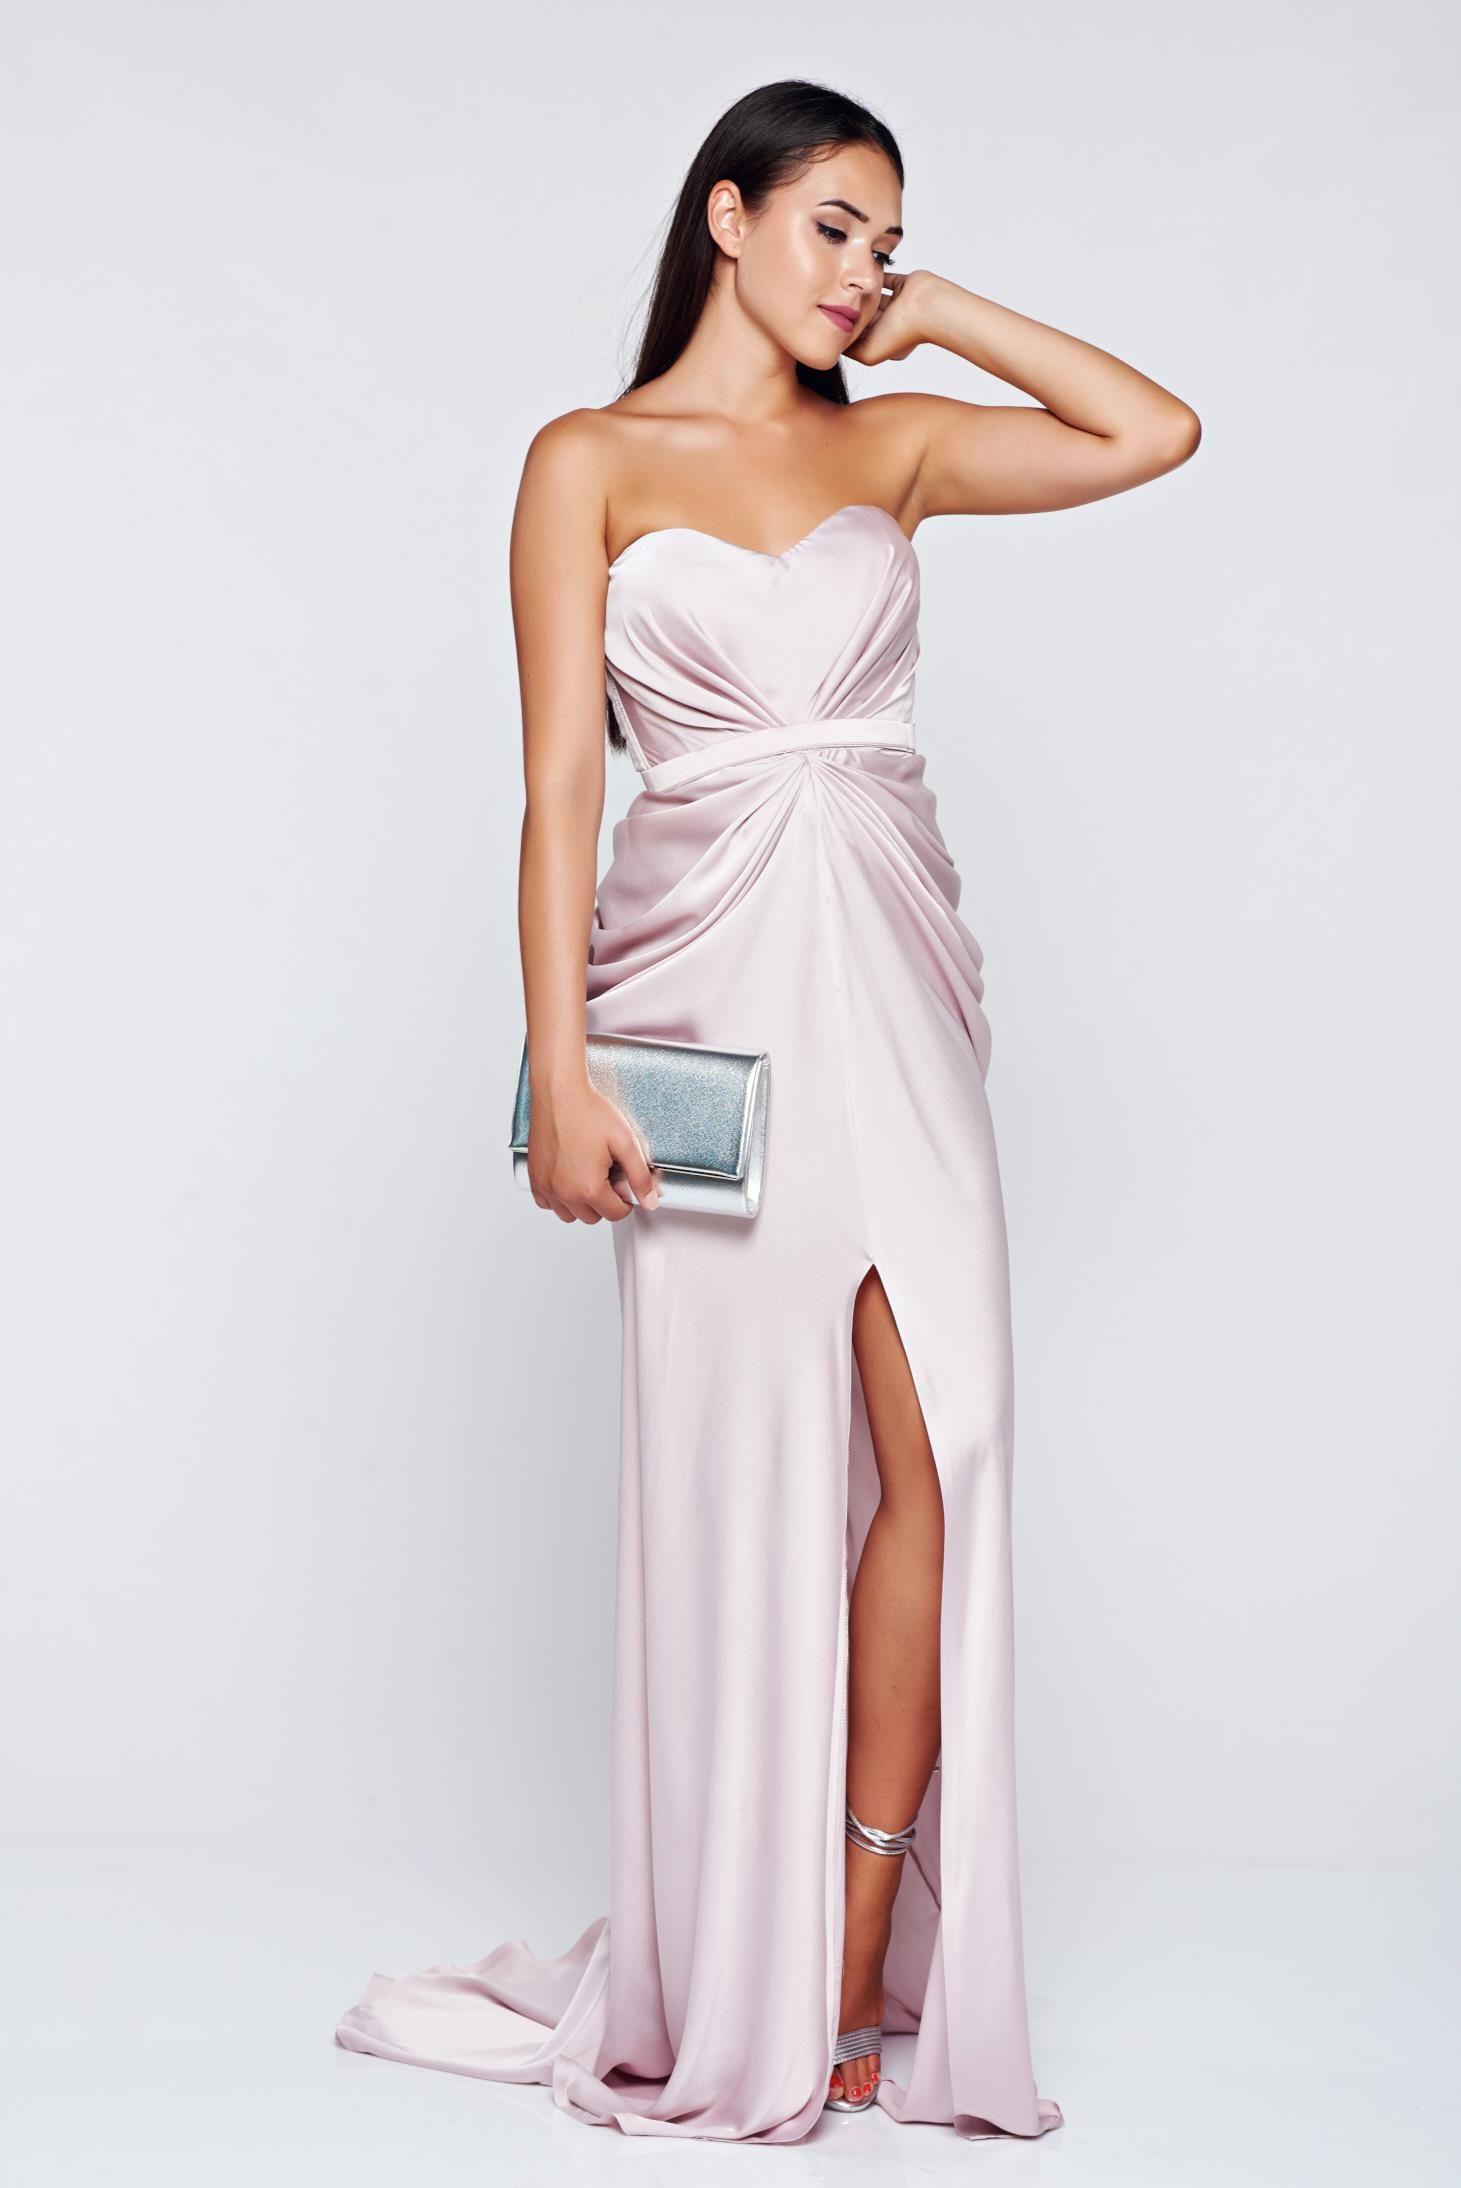 Ana radu luxurious off shoulder dress from satin fabric